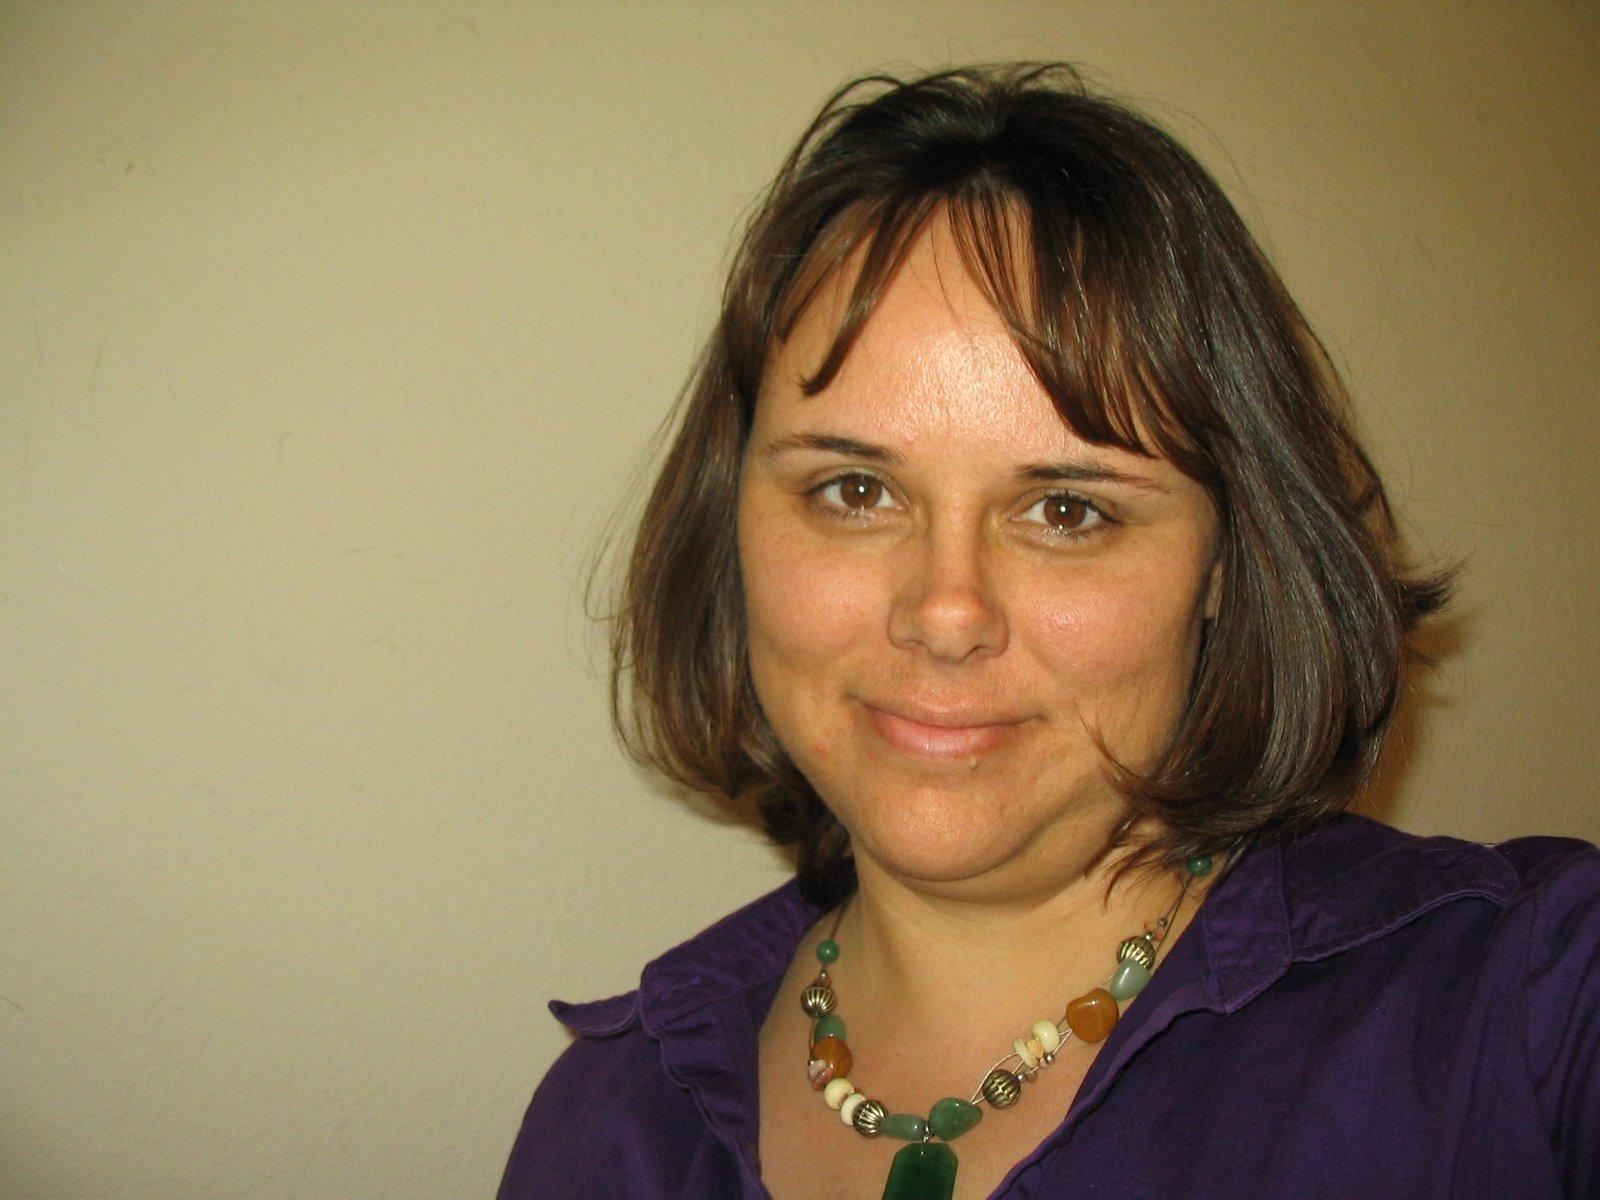 Beth (Semira's mom)